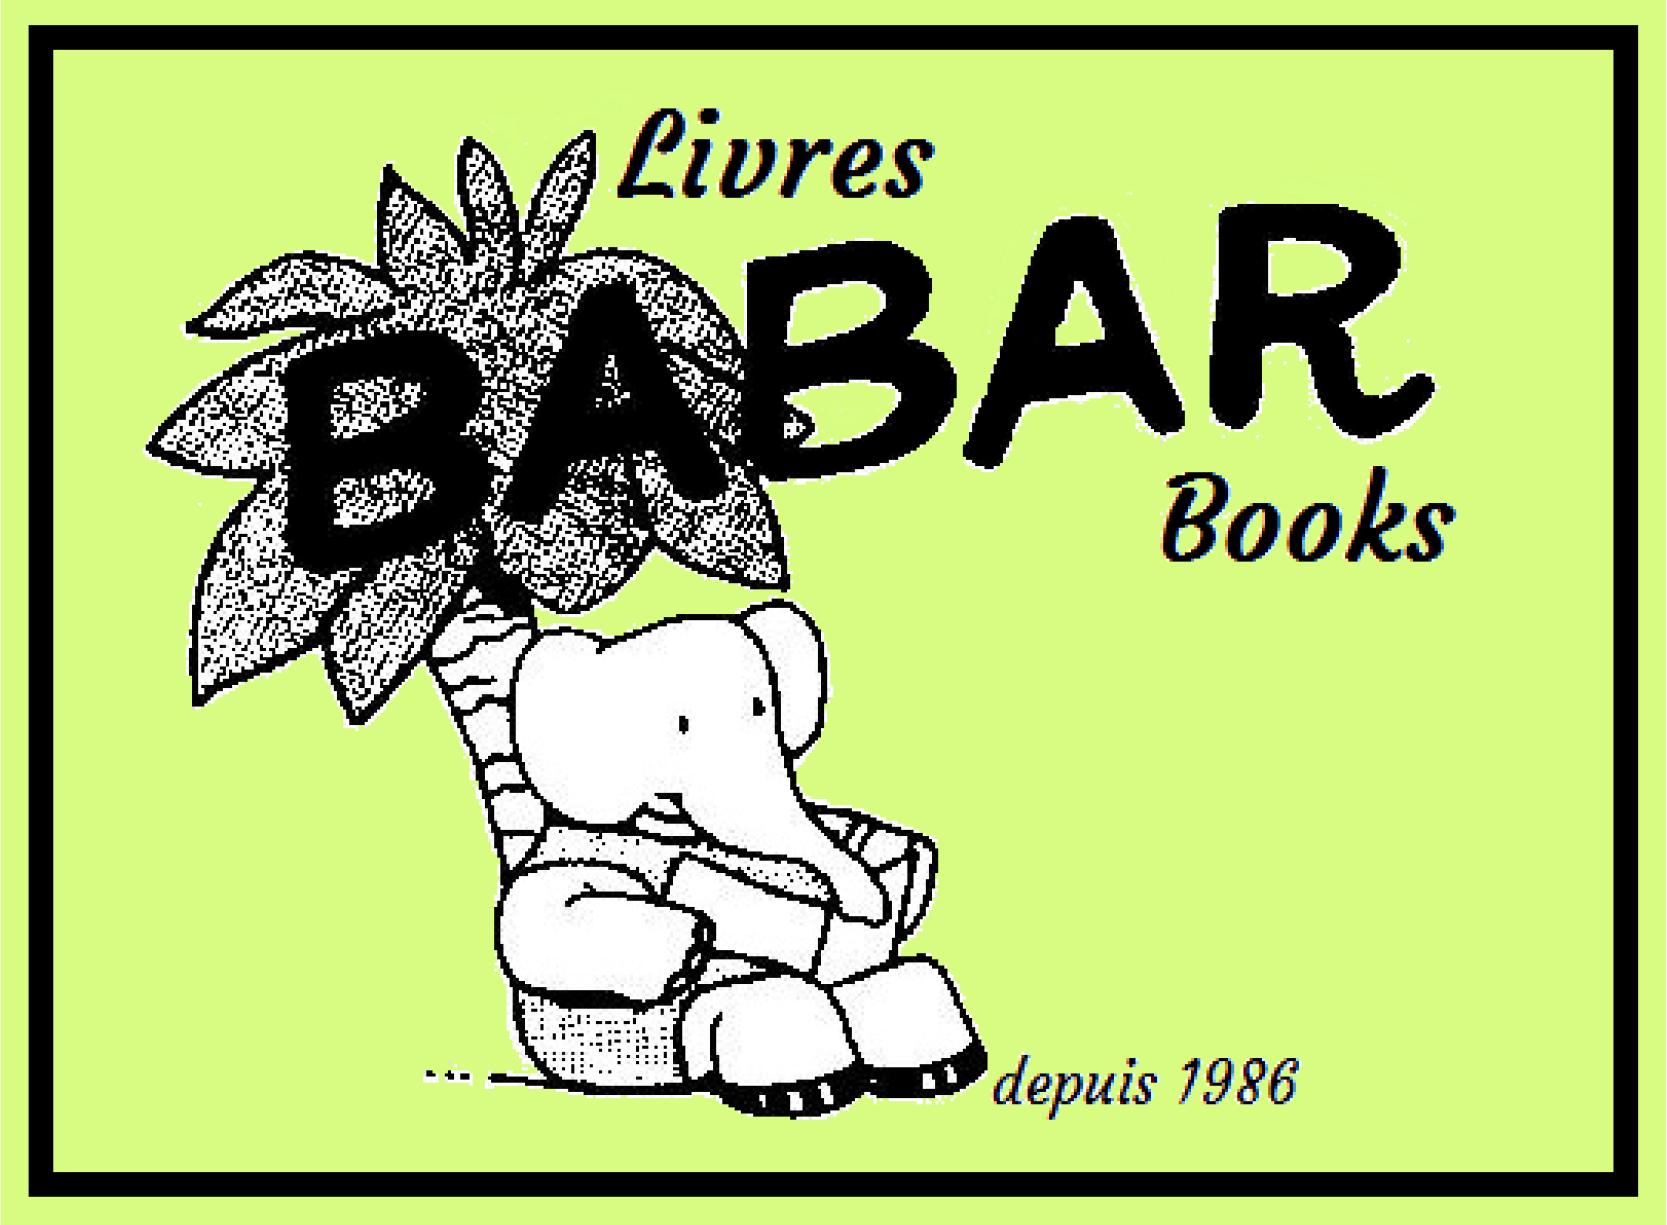 Livres Babar Books Logo